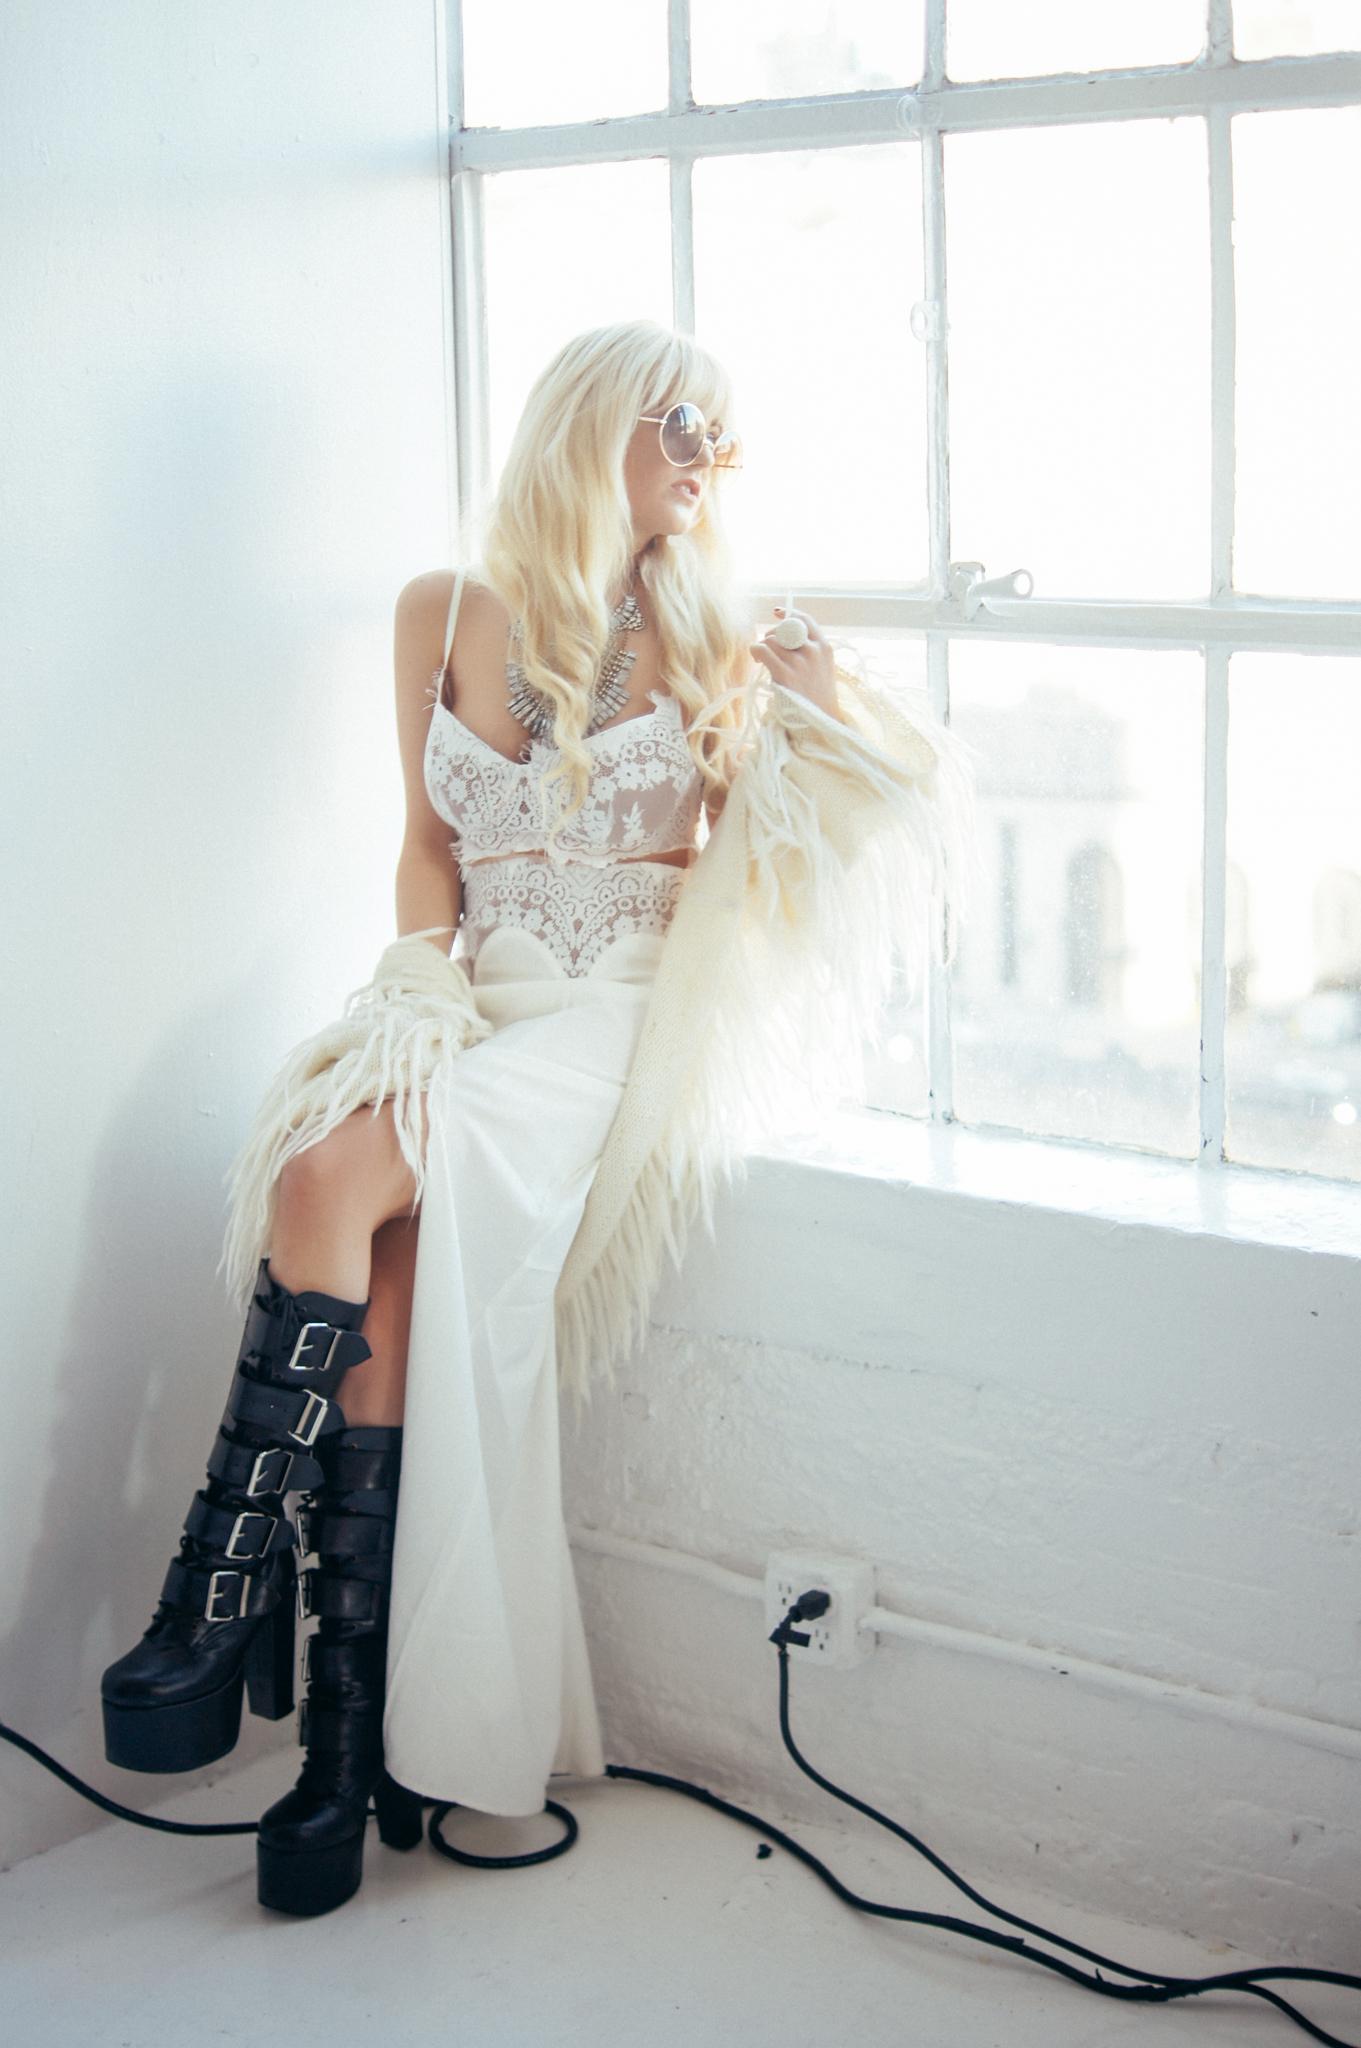 blonde-brittannytaylor-11.jpg